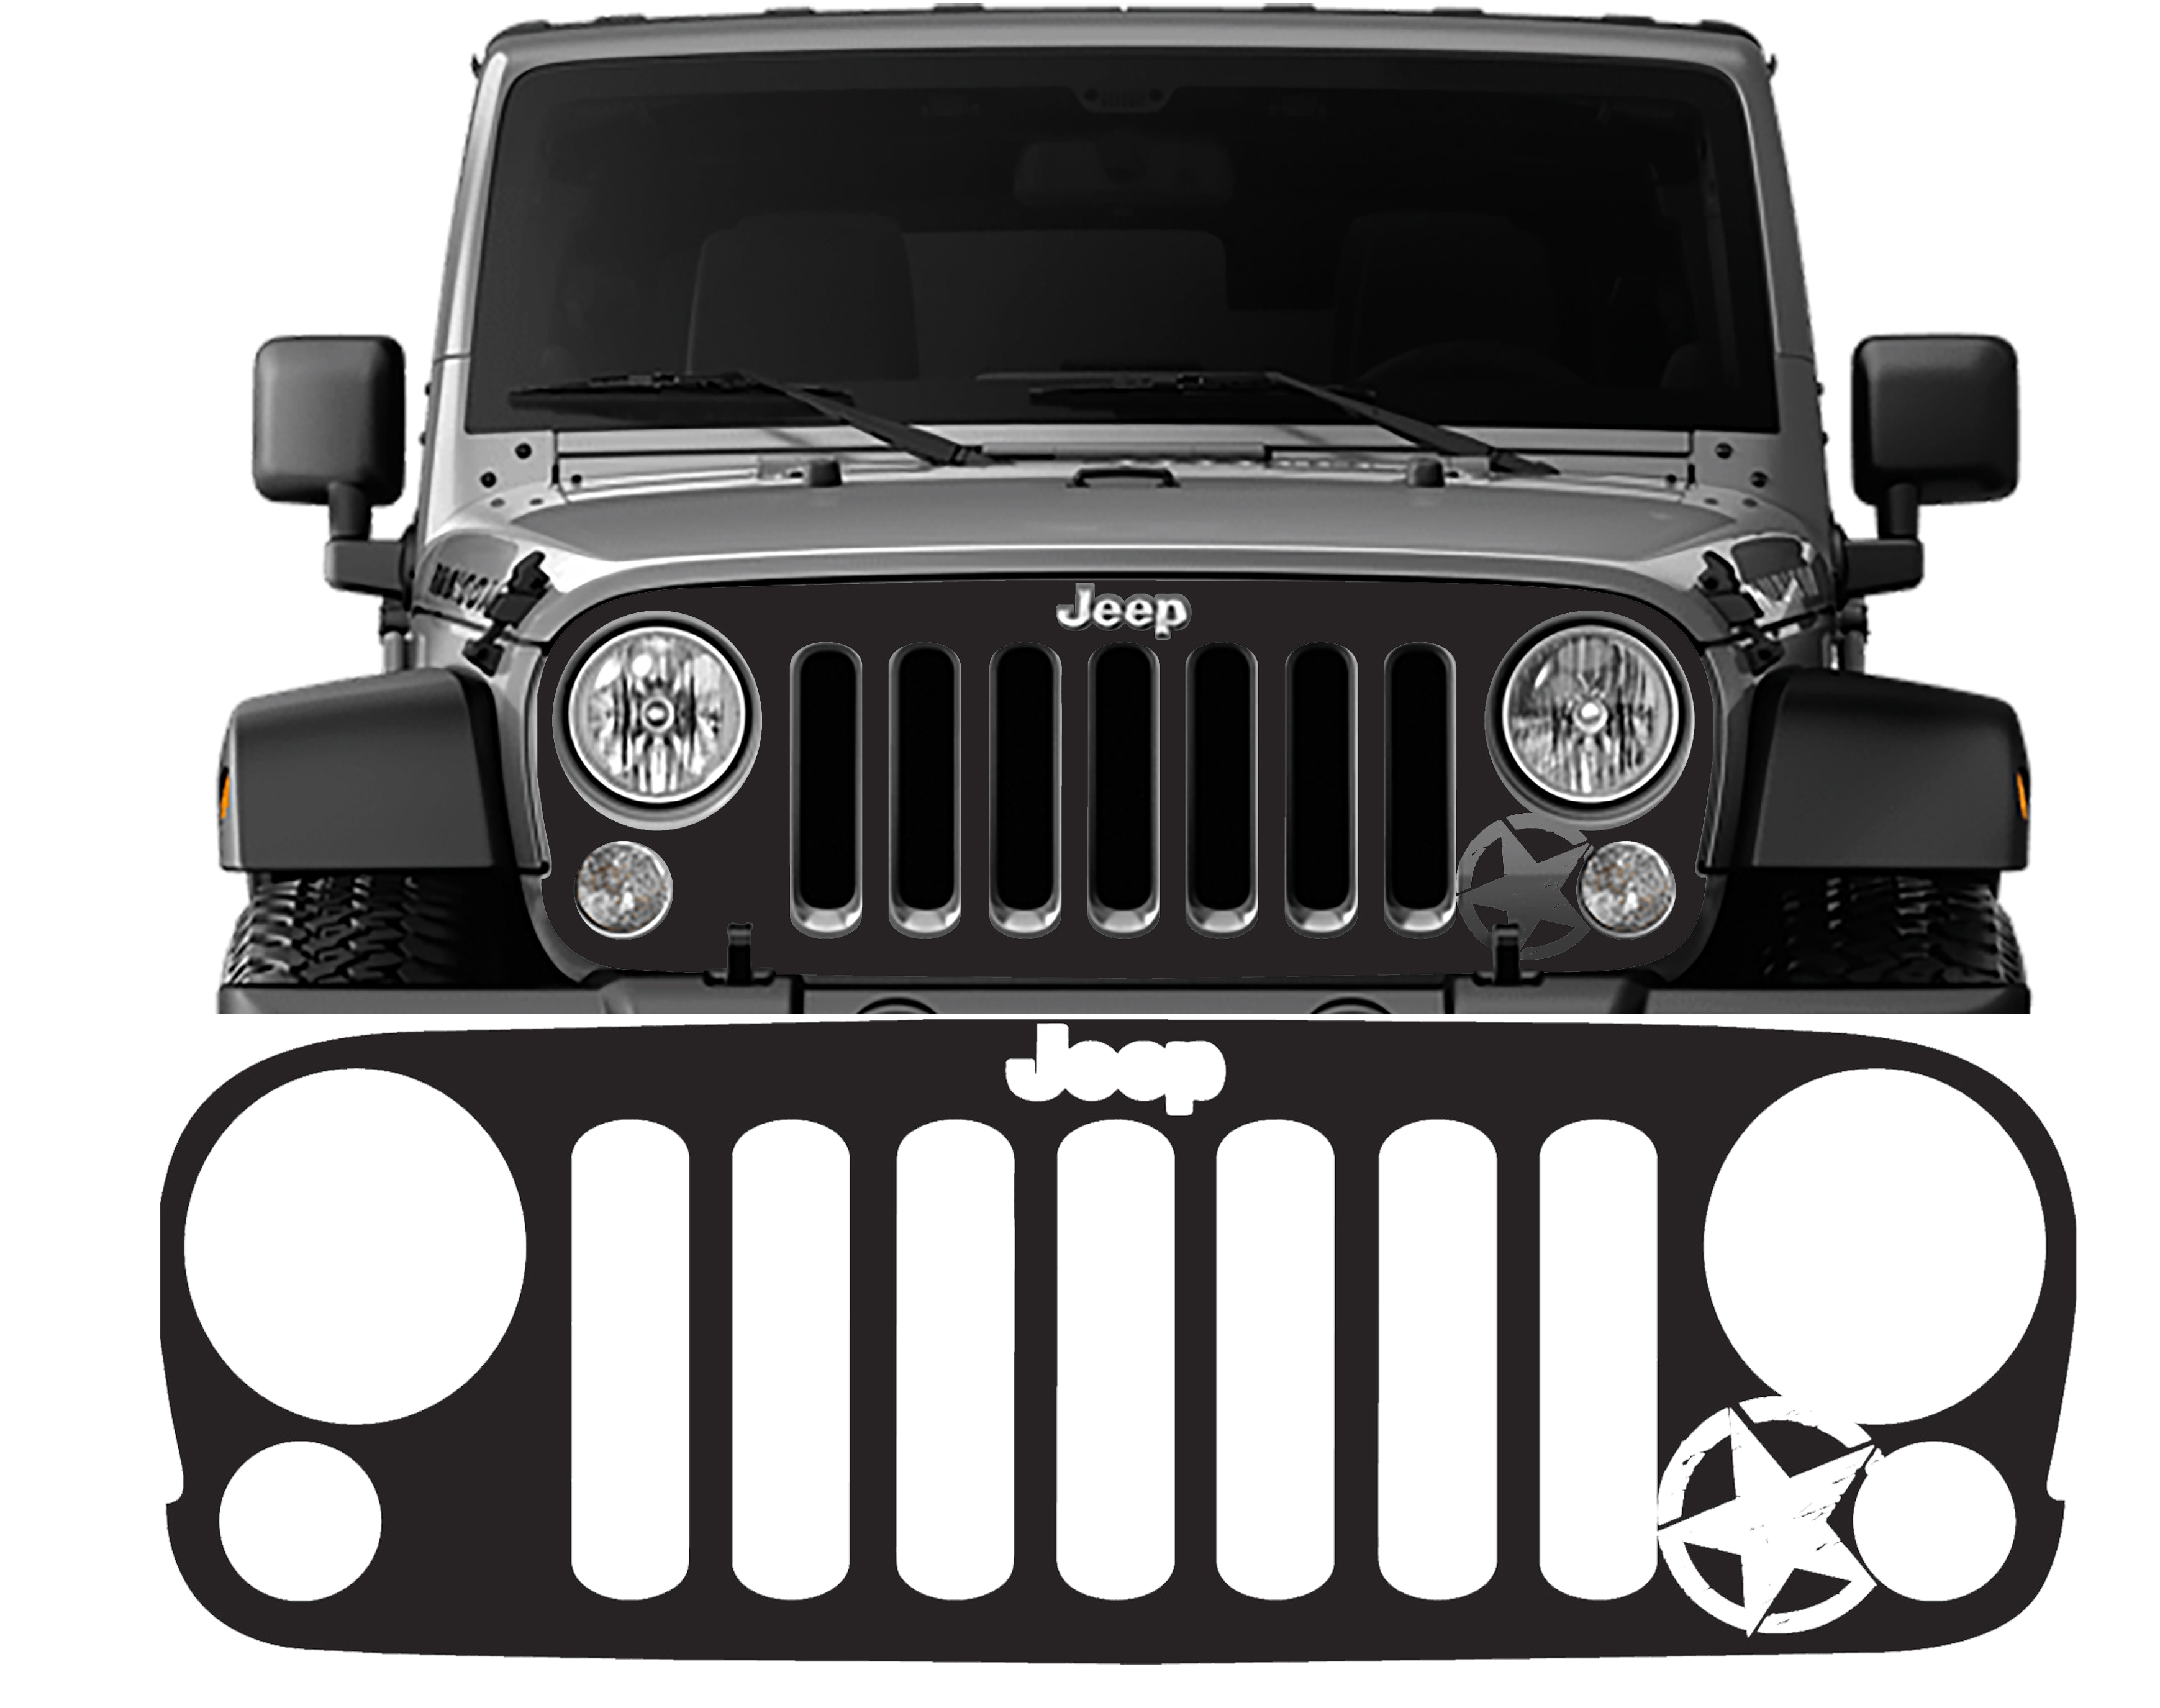 Jeep Wrangler Grill >> Jeep Wrangler 07 18 Jk Grille Vinyl Decal Overlay